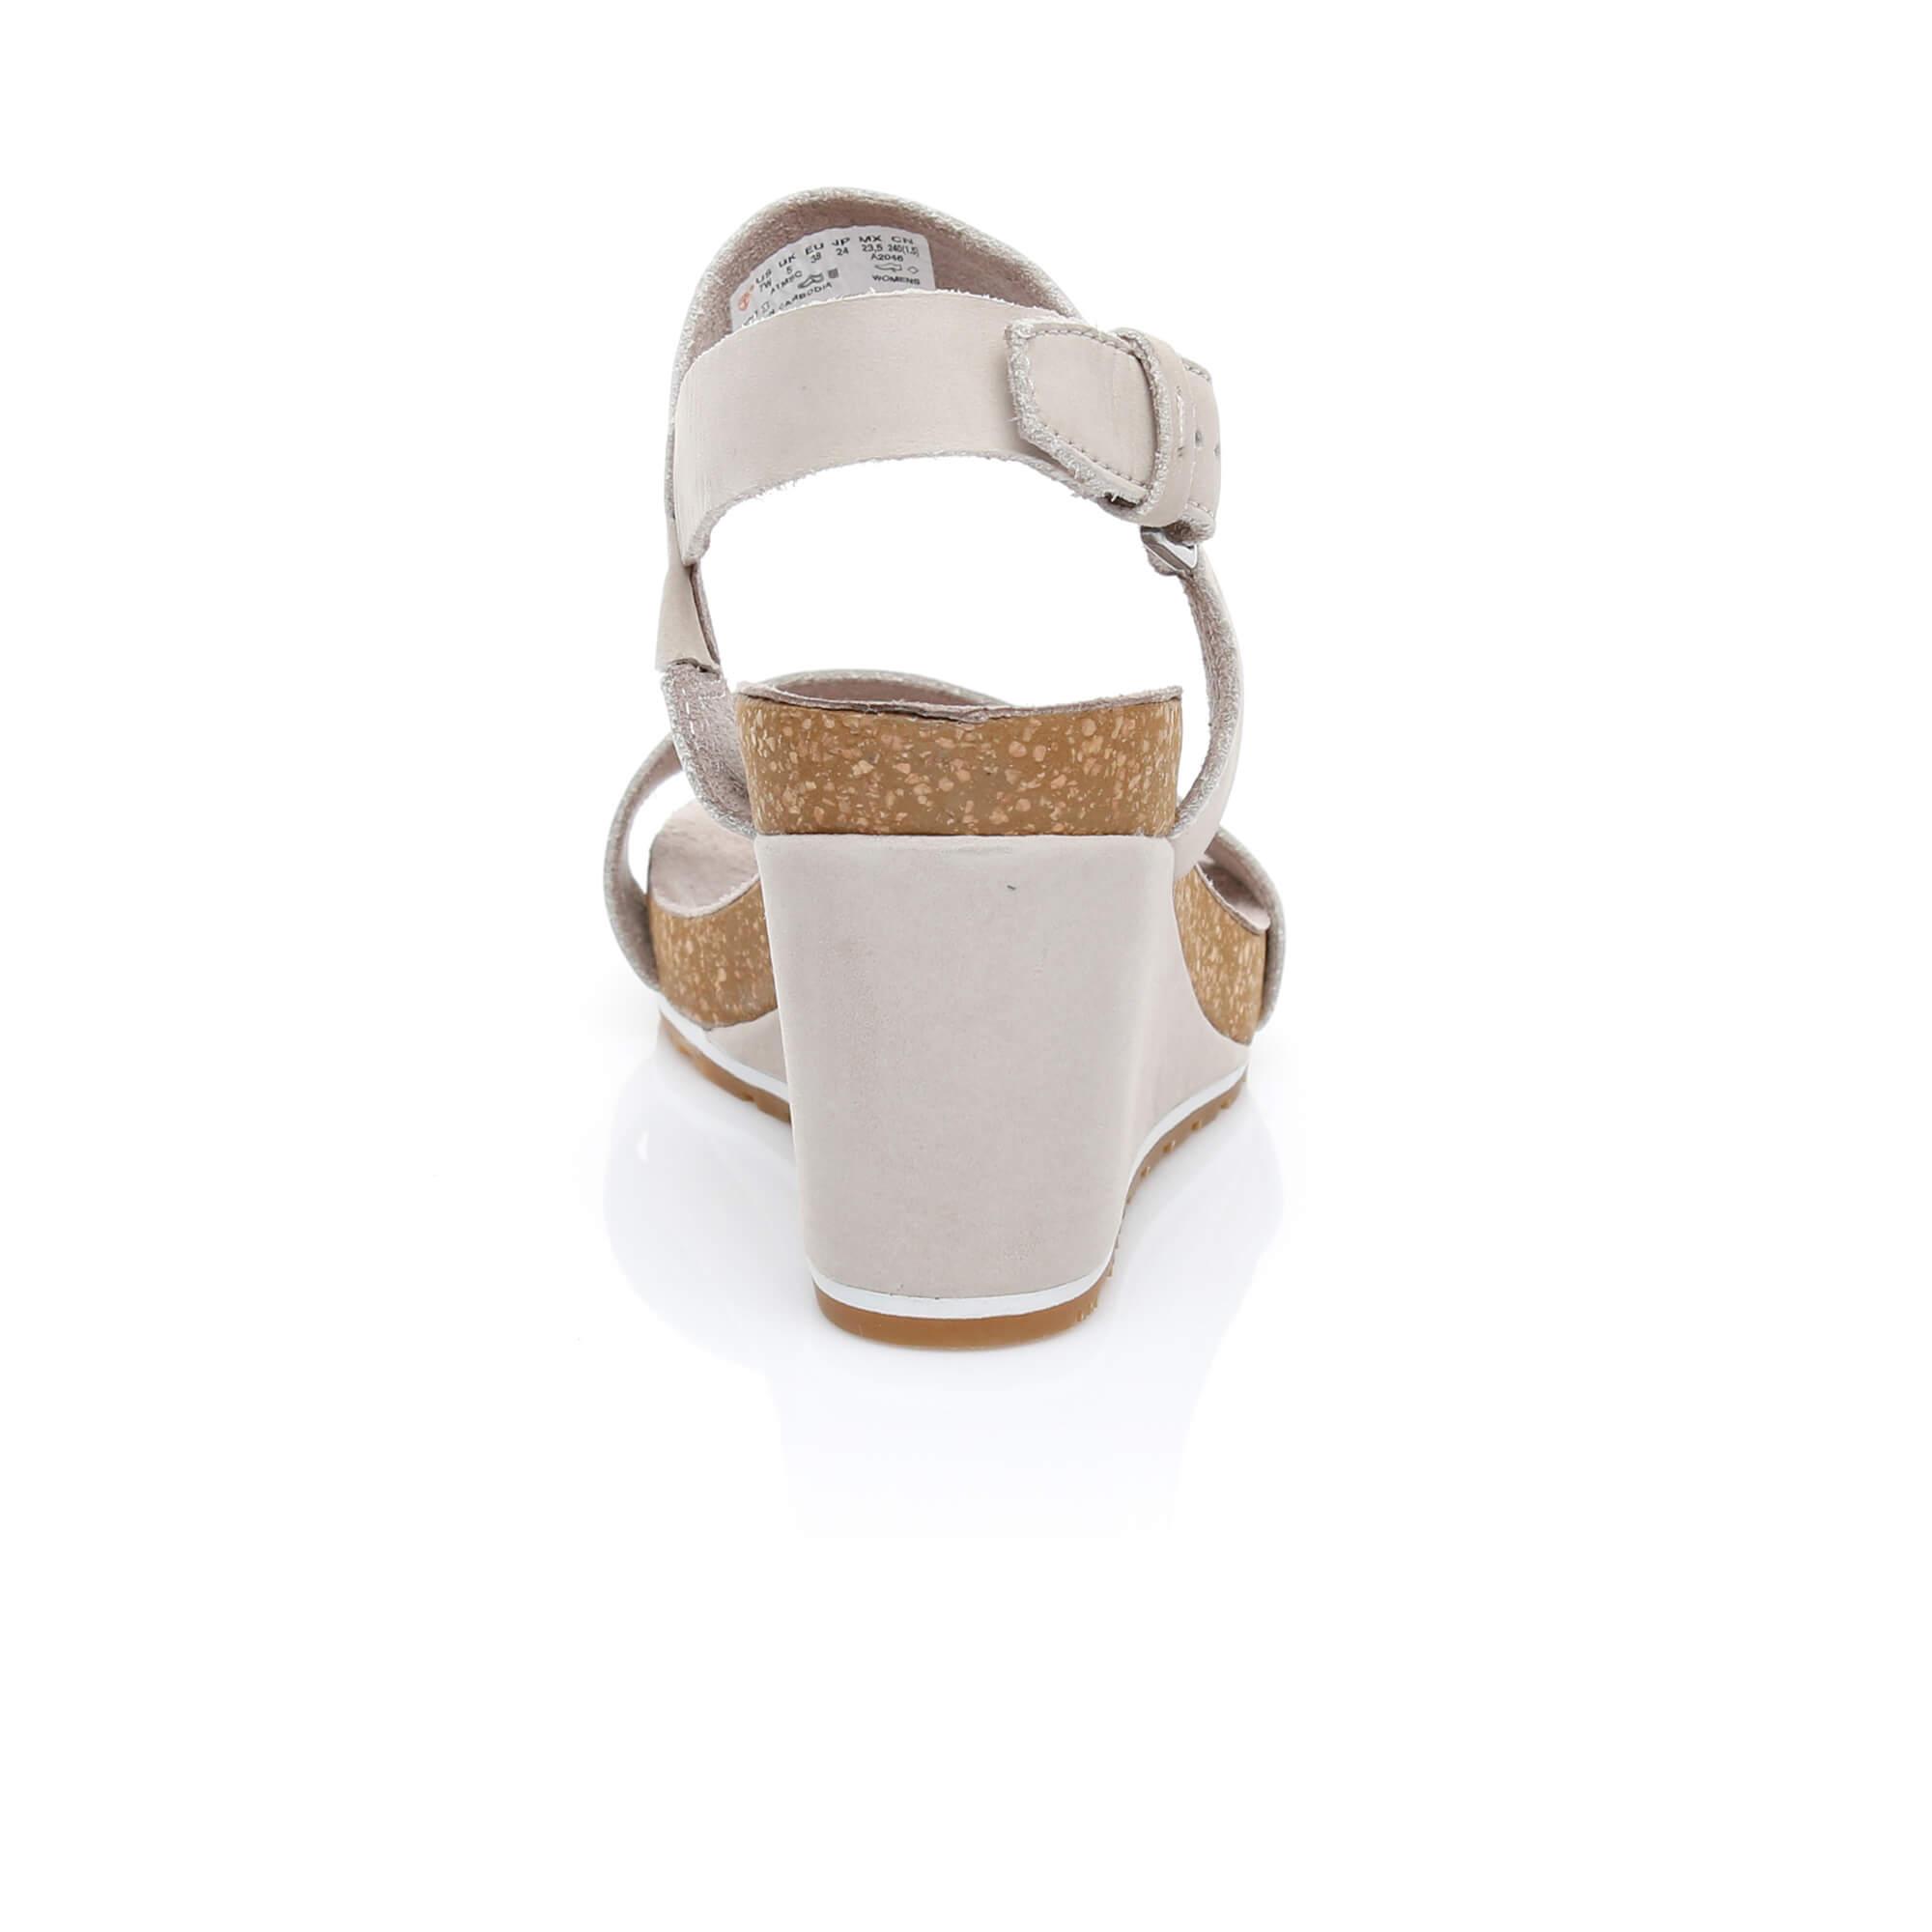 Timberland Capri Sunset Kadın Bej Dolgu Topuk Ayakkabı